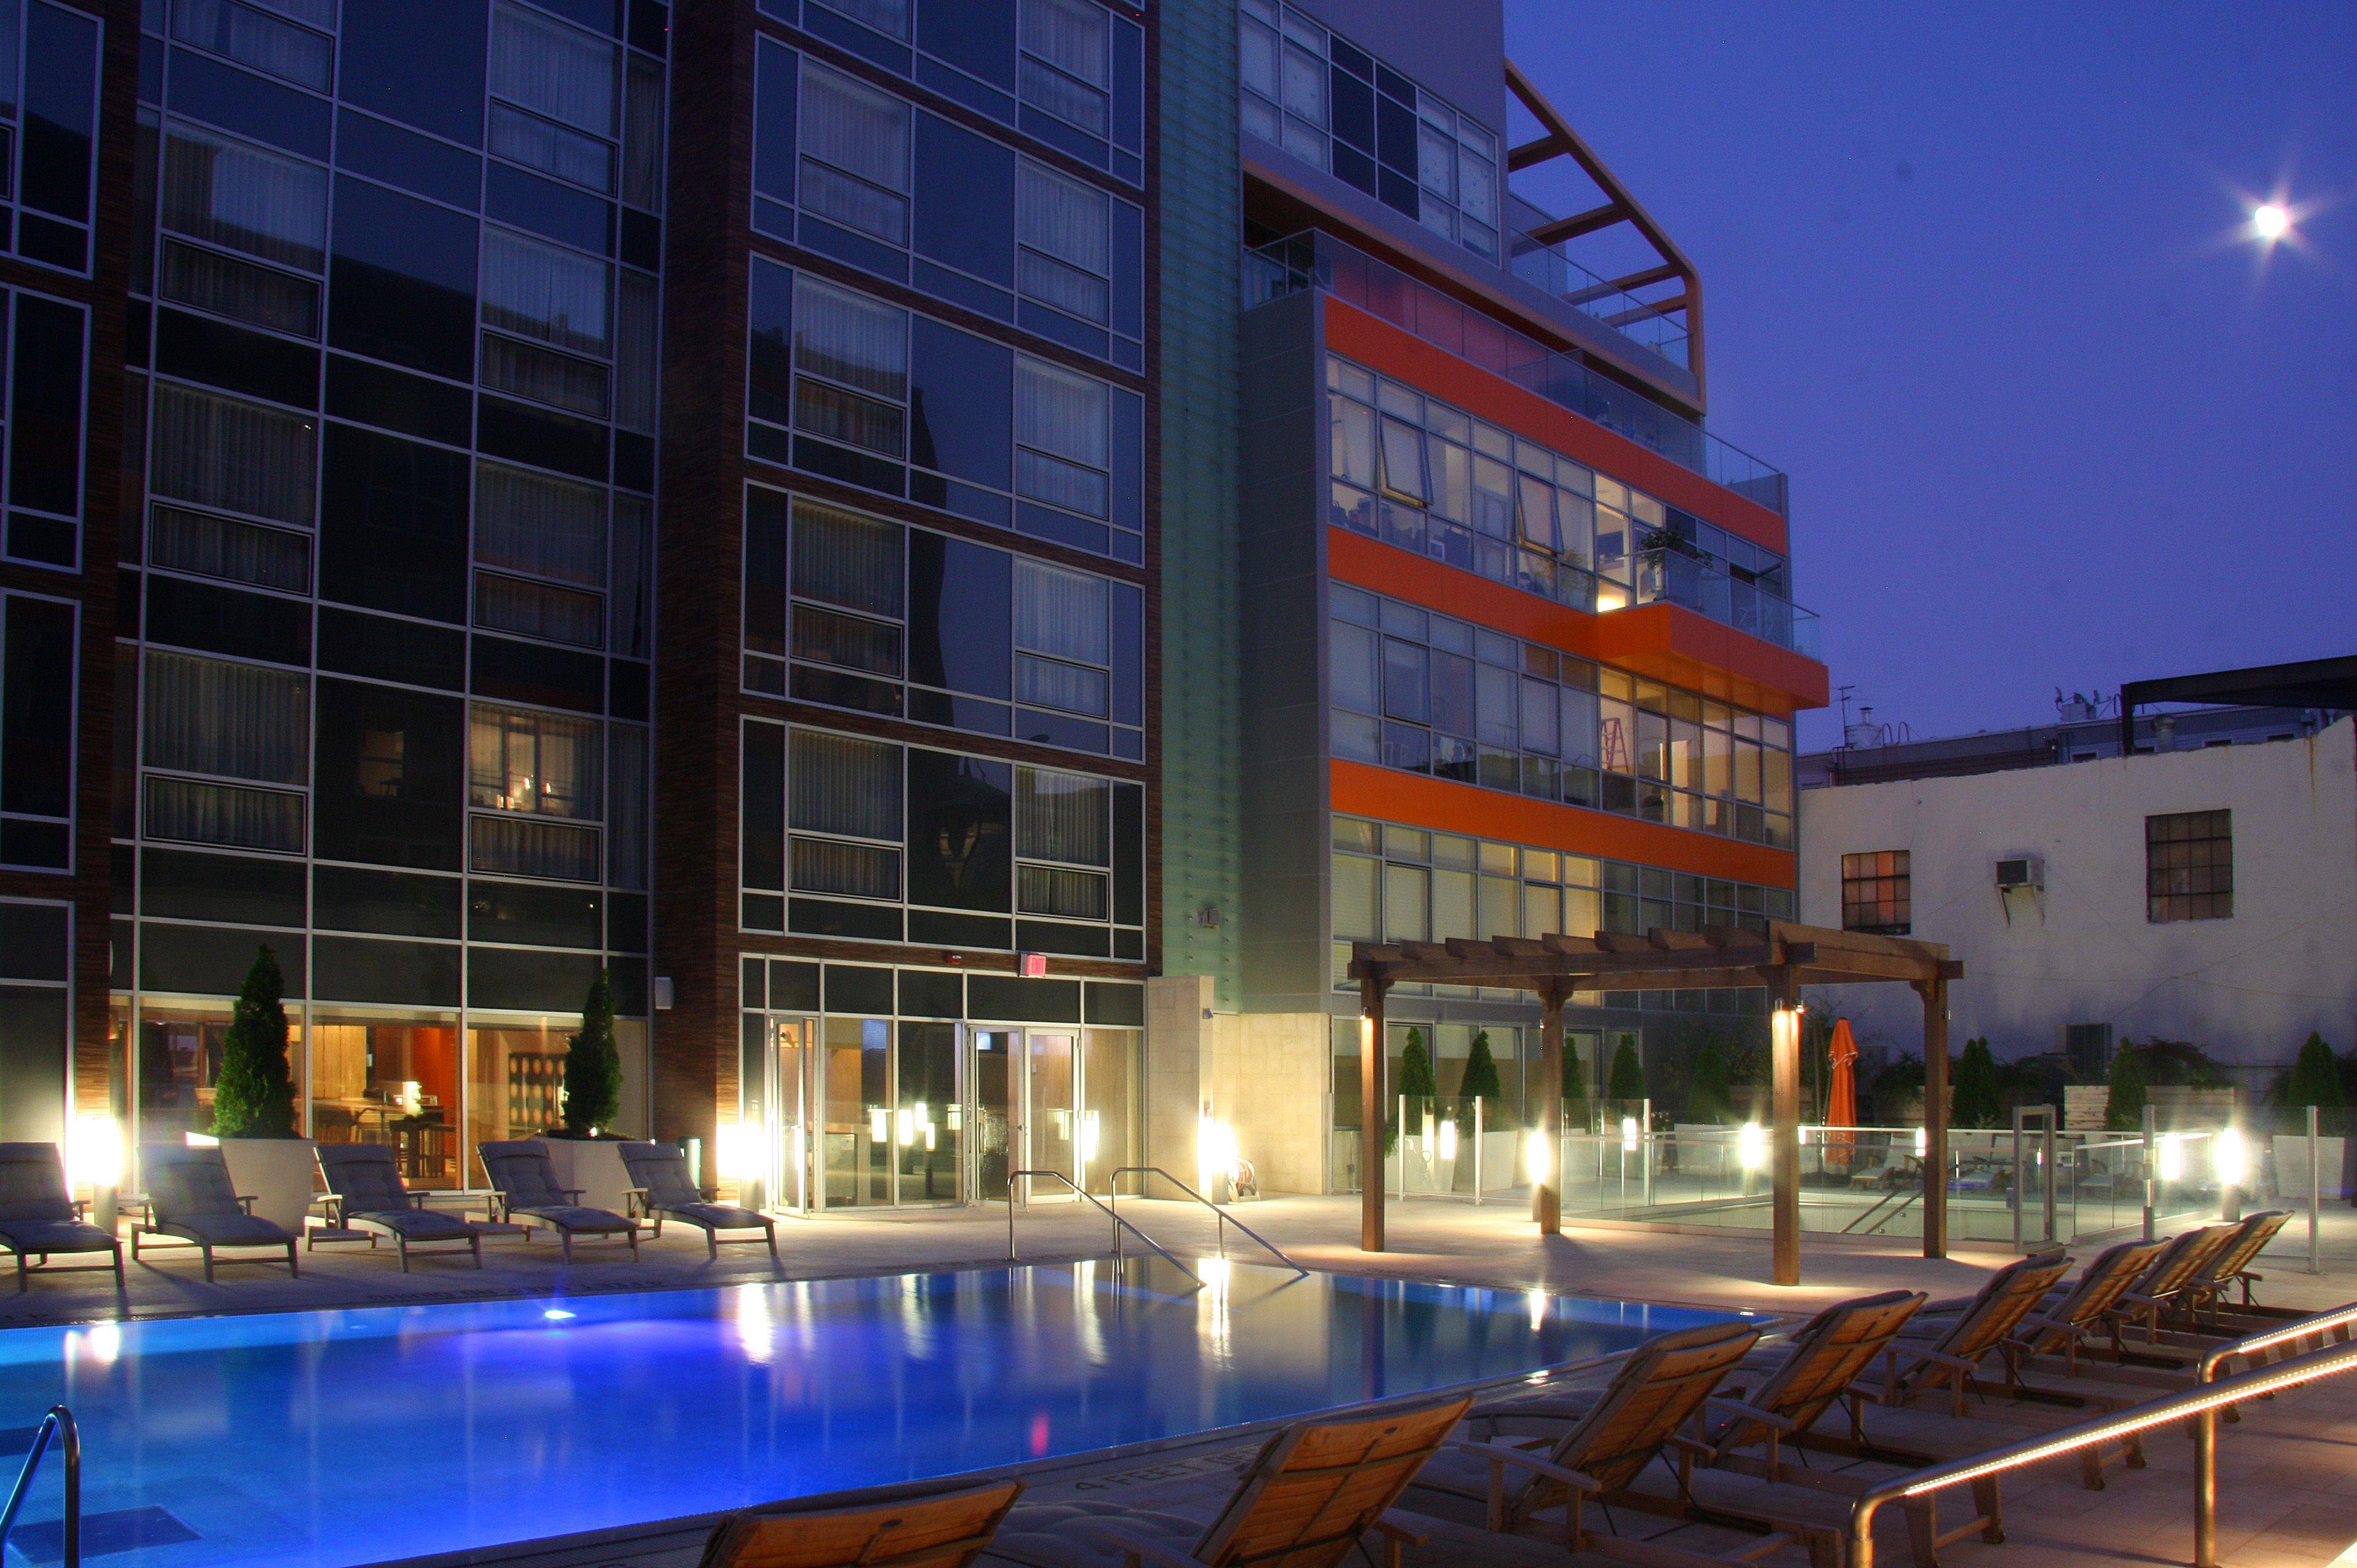 Mccarren Hotel & Pool Williamsburg